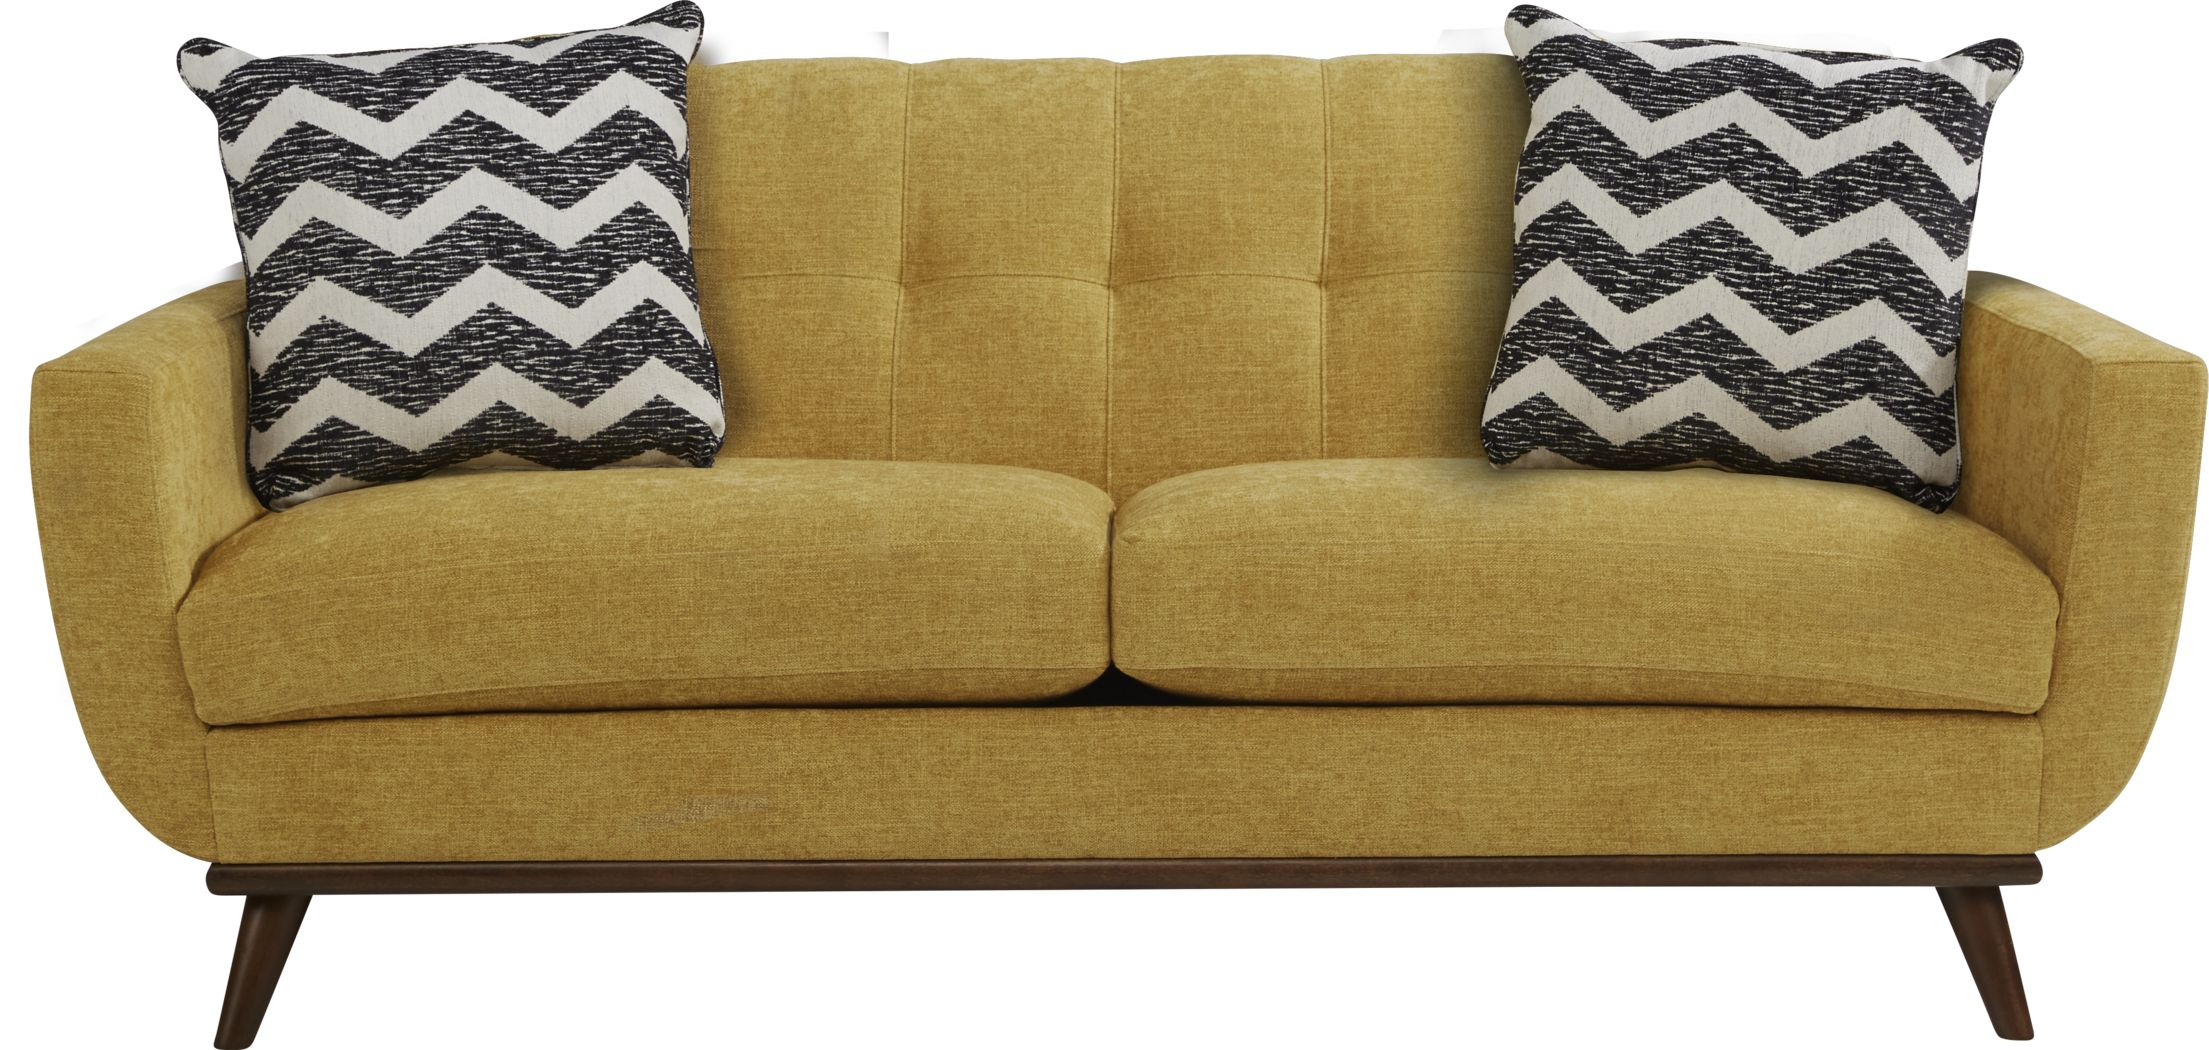 East Side Sunflower Apartment Sofa